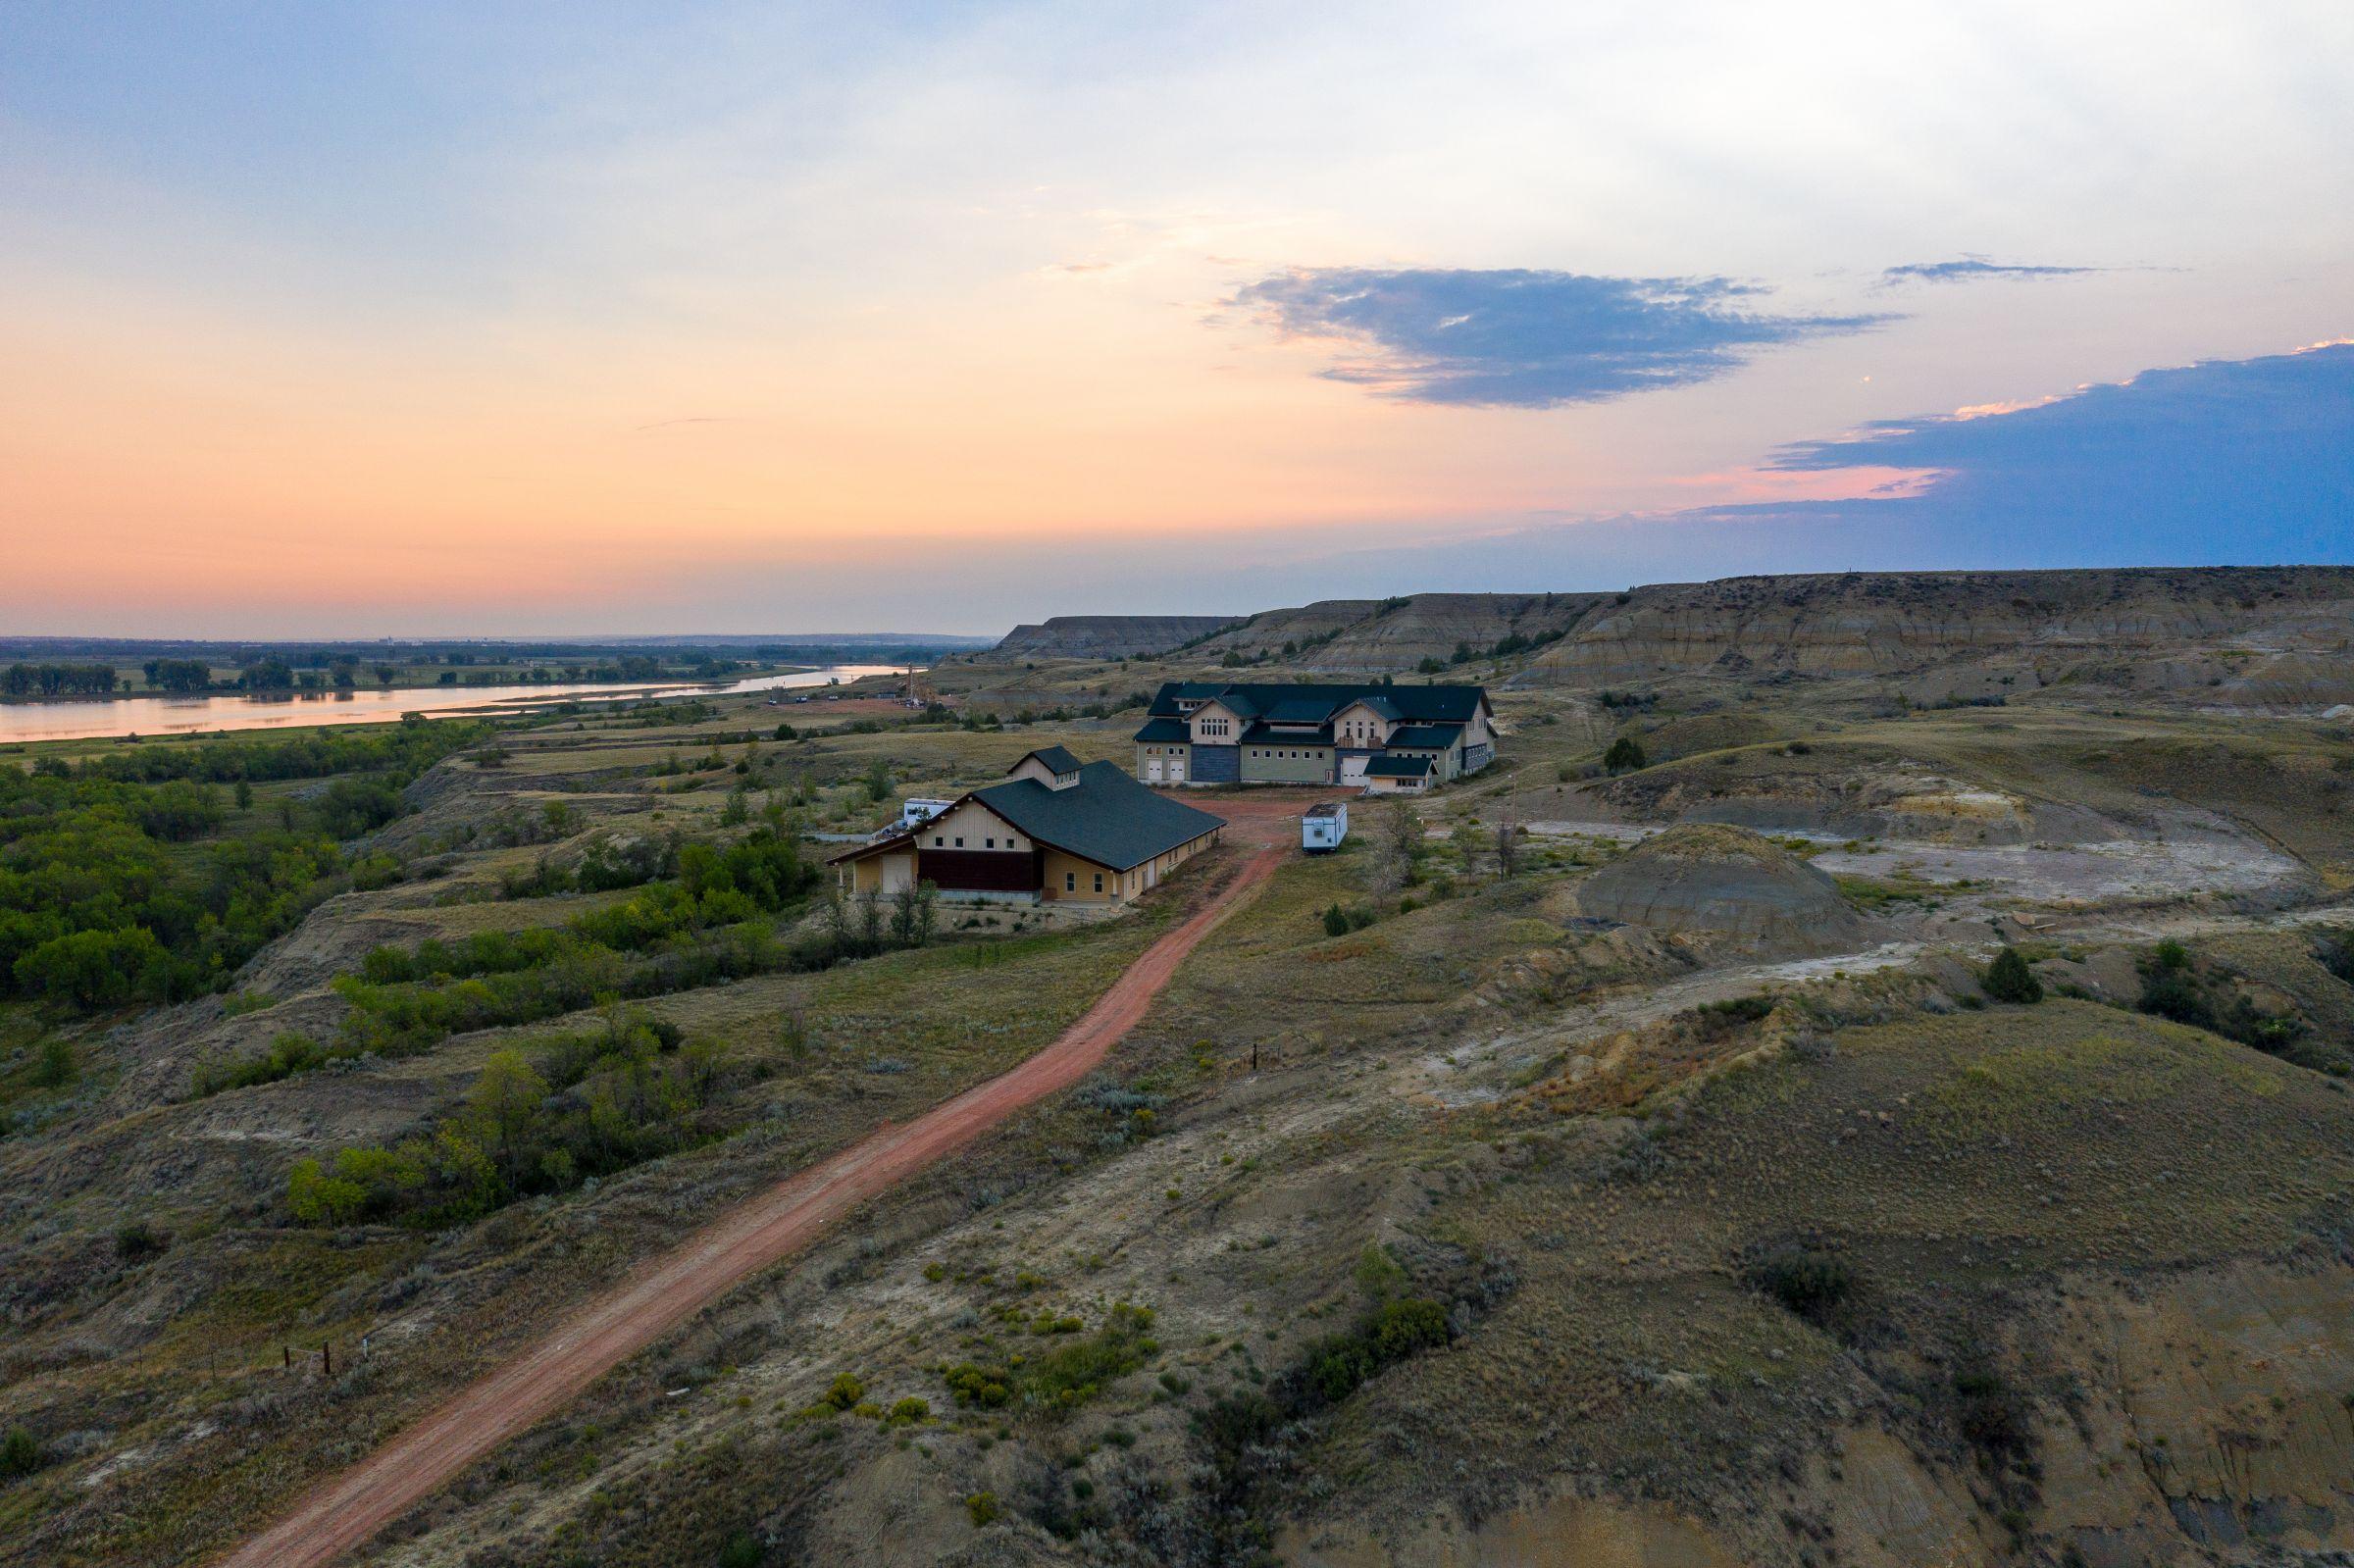 auctions-land-mckenzie-county-north-dakota-270-acres-listing-number-15735-0-2021-09-09-202108.jpeg